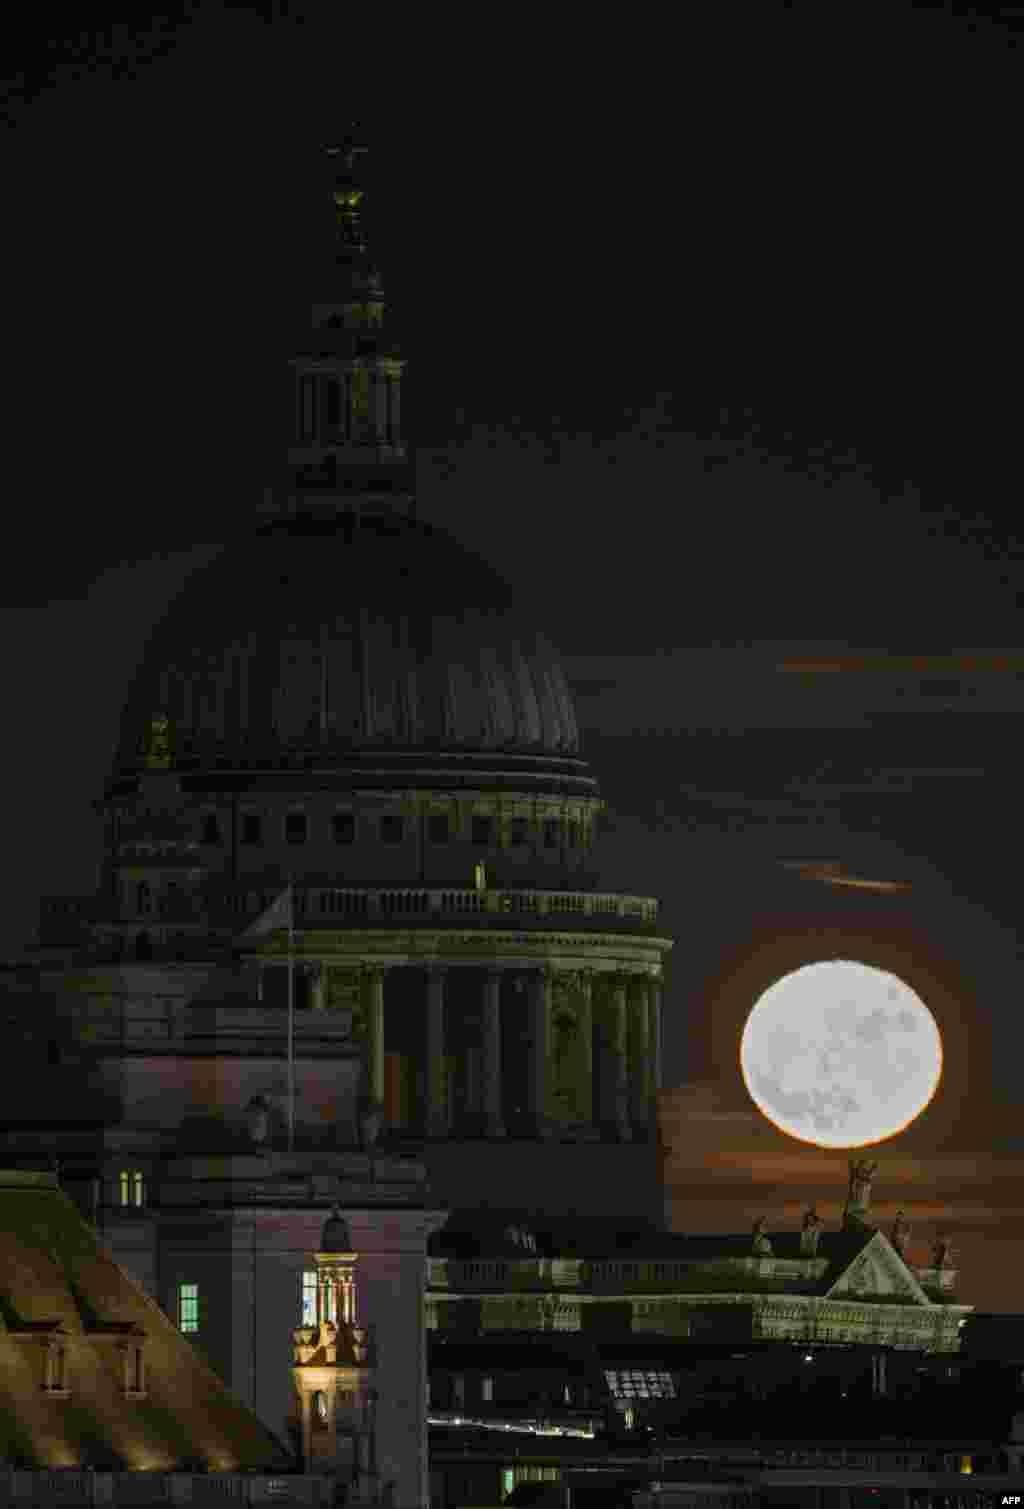 Bulan purnama (supermoon) tampak di belakang Katedral St. Paul di London, Inggris.